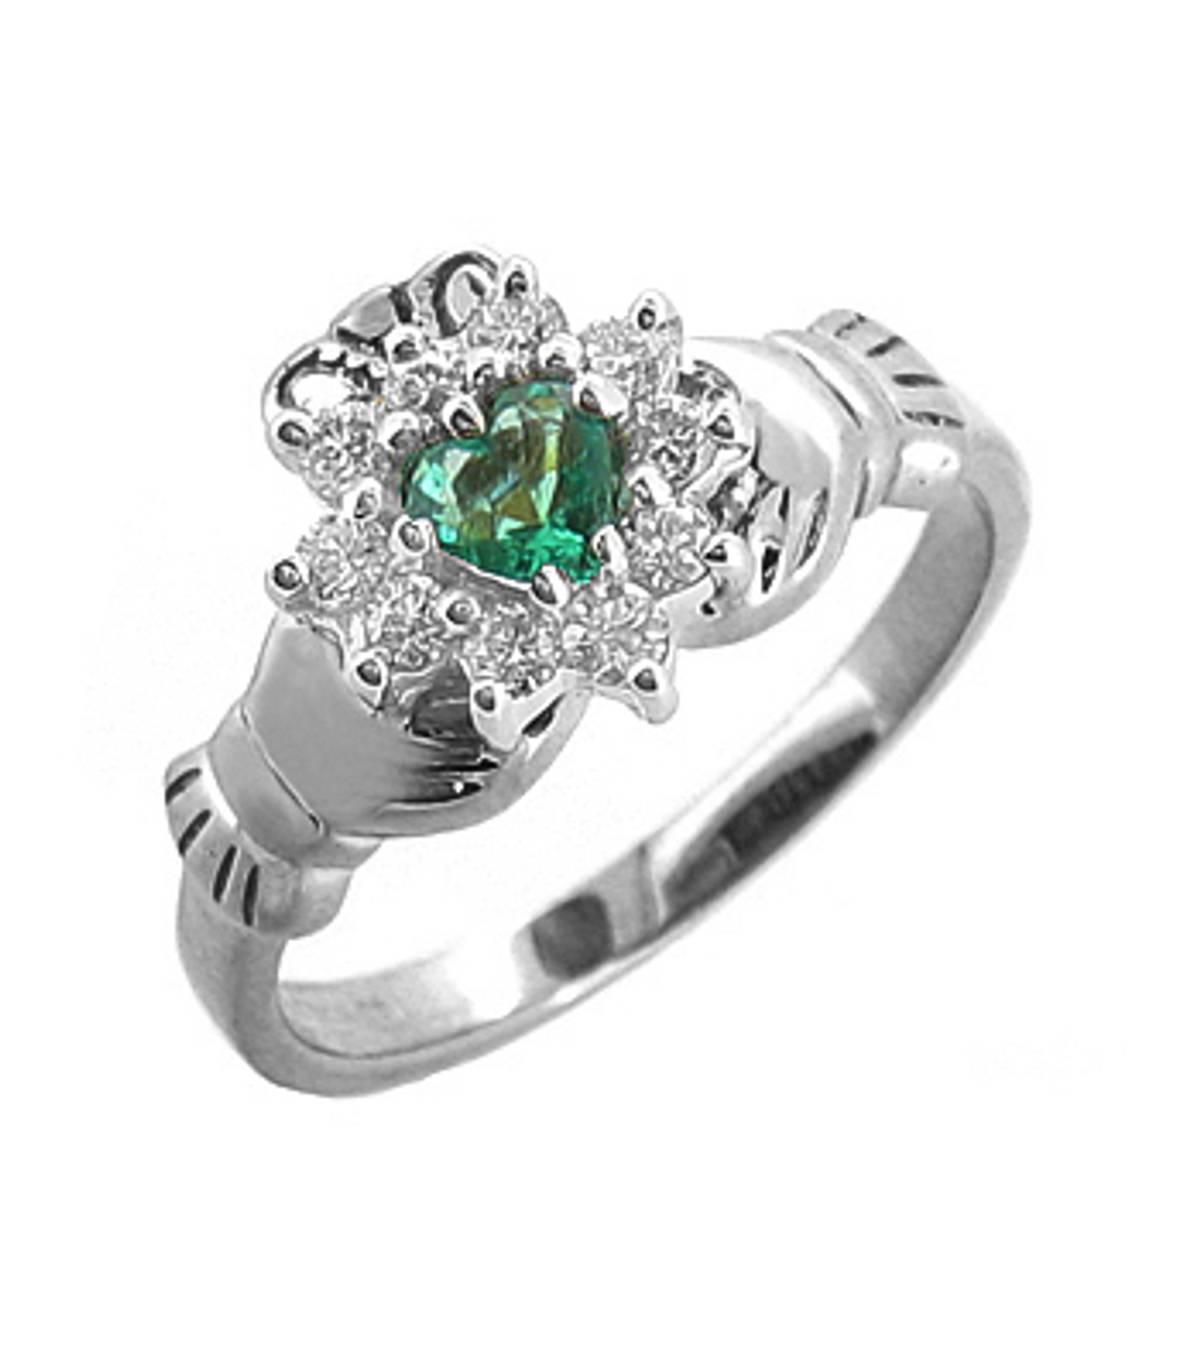 Irish made14 carat white gold 0.25cts emerald/0.26cts diamonds claddagh engagement ring